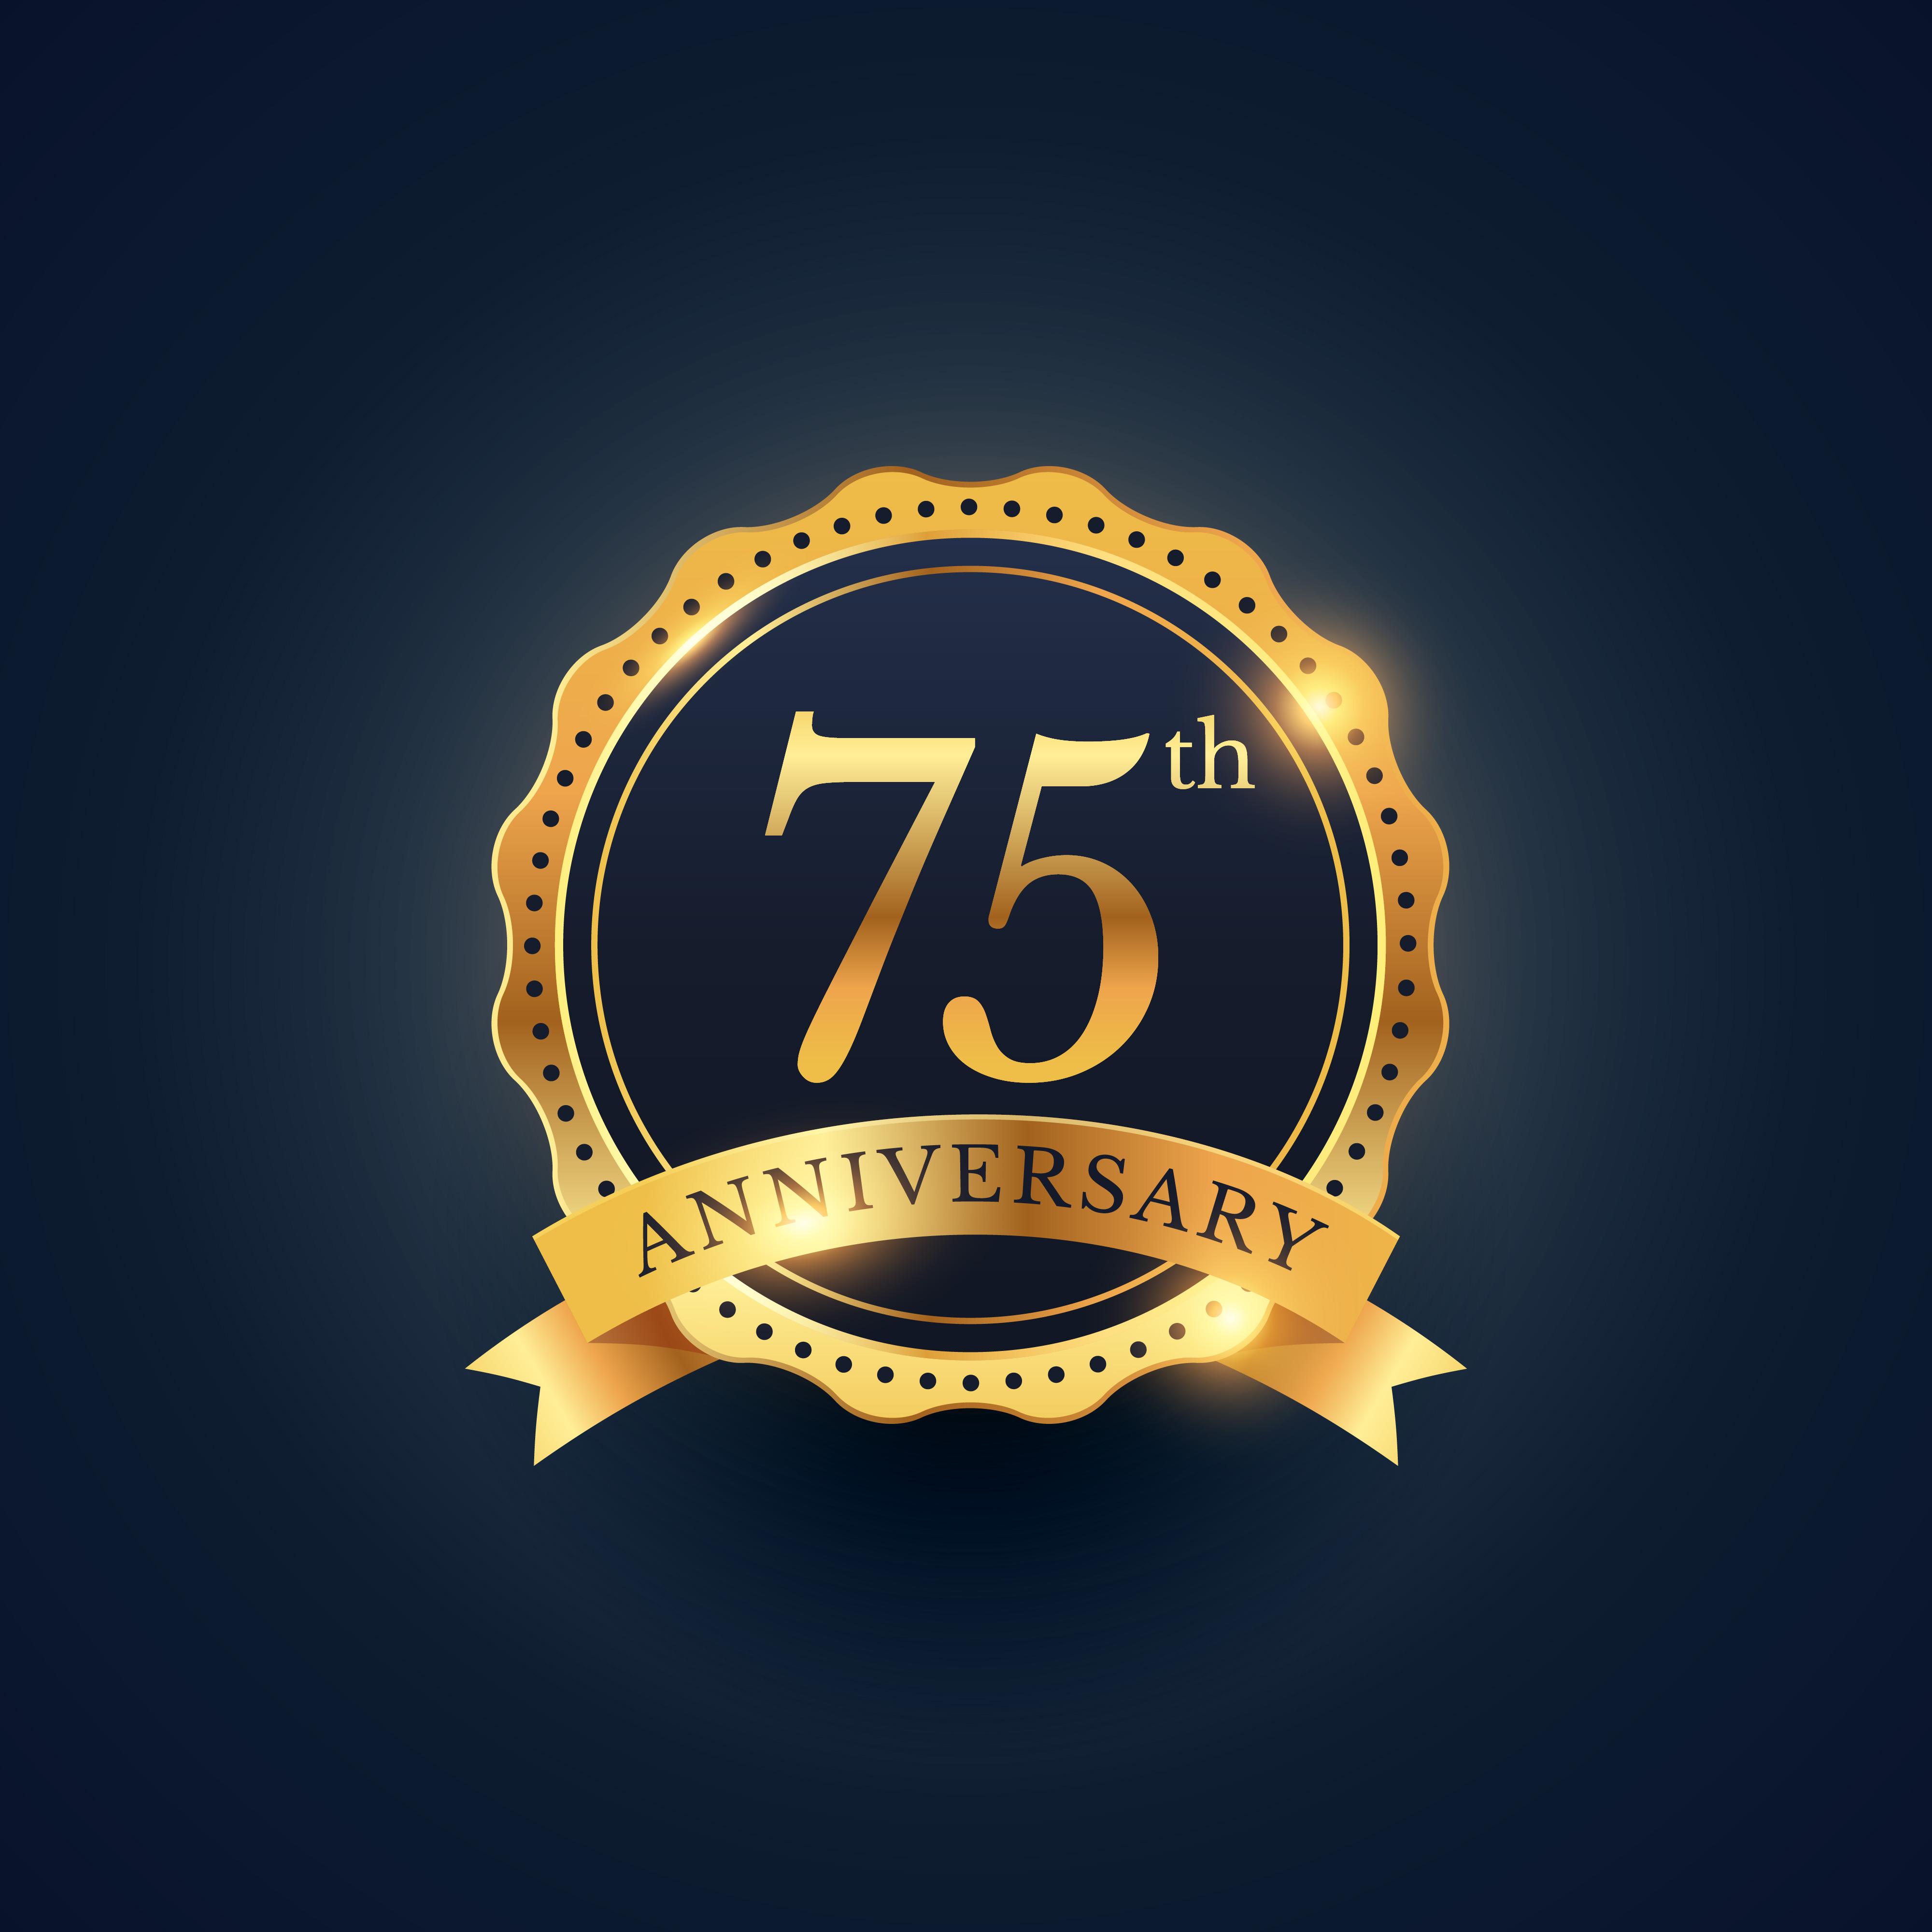 75th Anniversary Celebration Badge Label In Golden Color Download